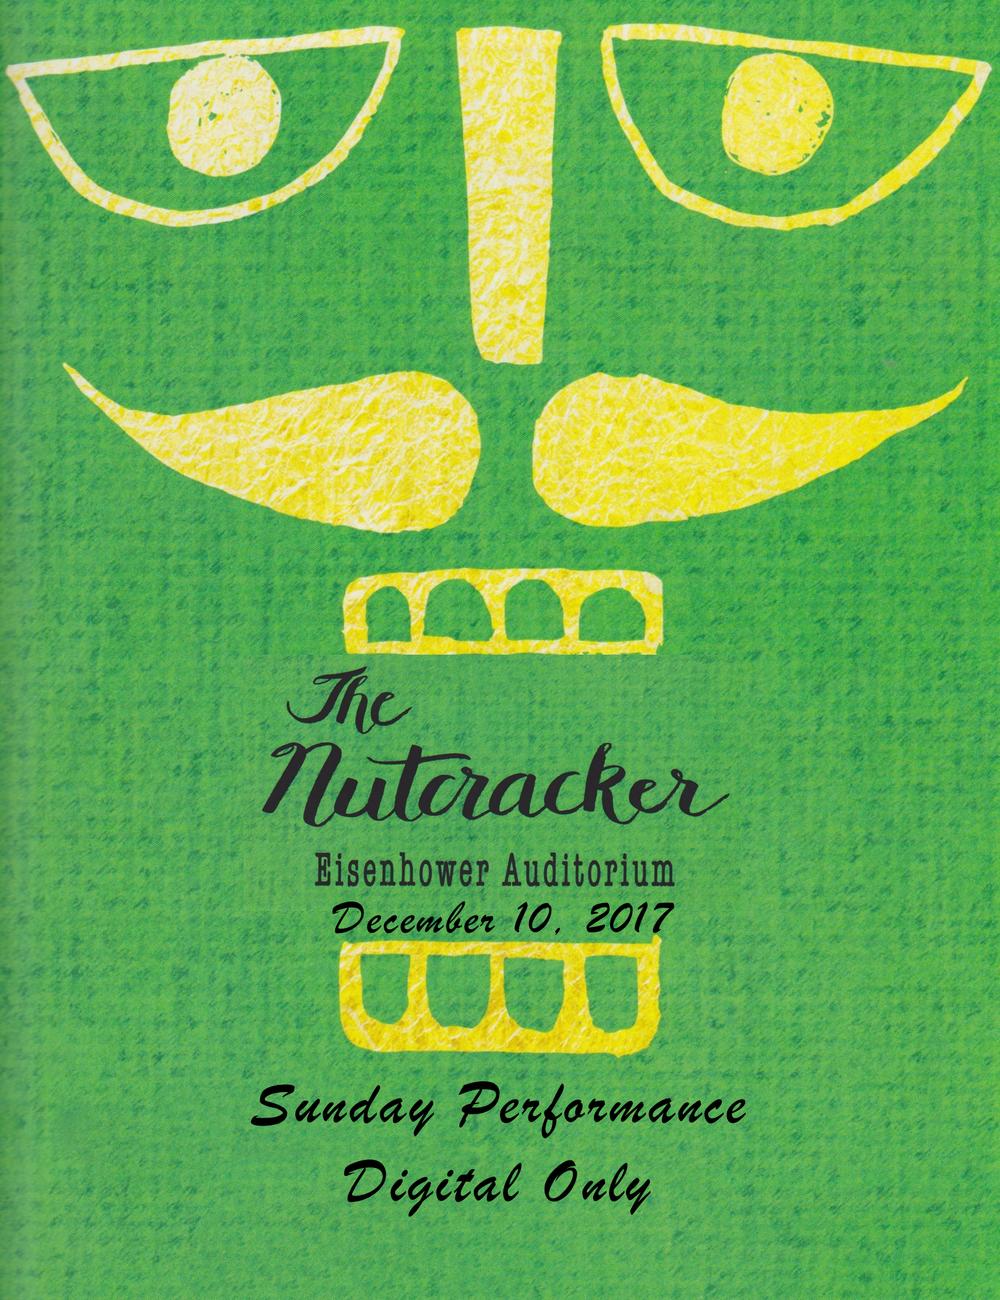 Sunday Performance, Digital Copy Only